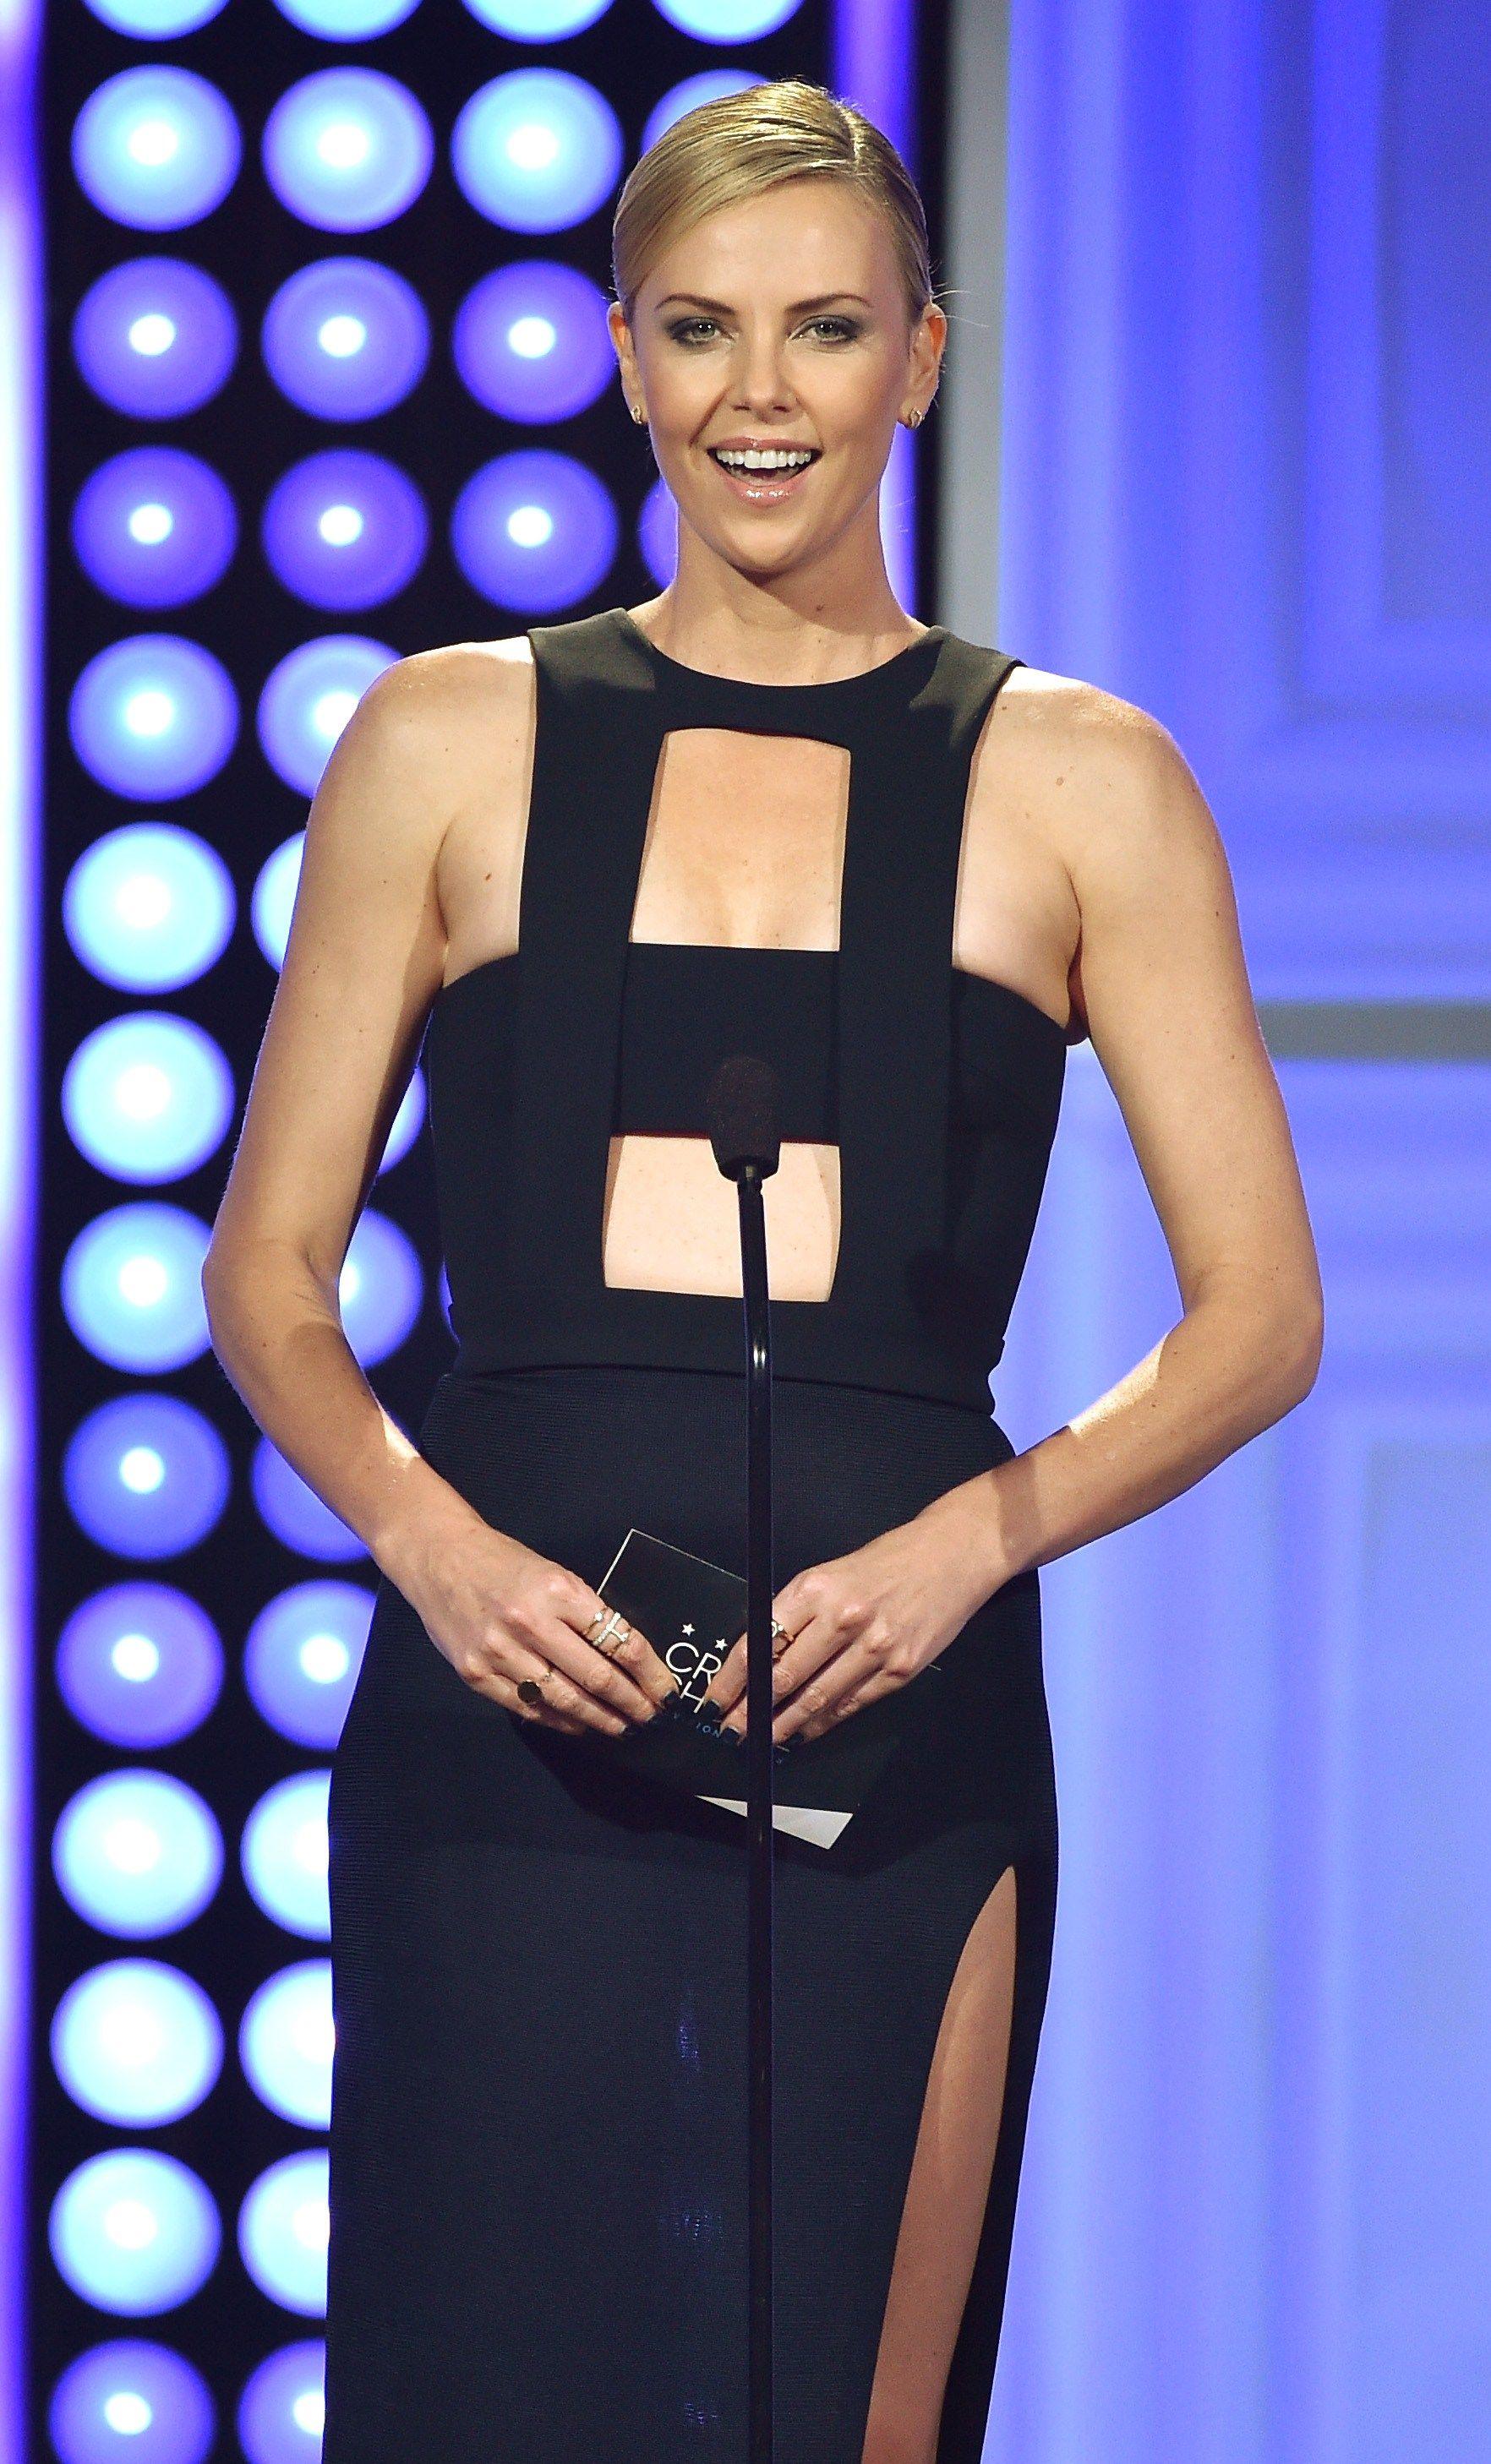 ETTERTRAKTET: Charlize Theron er blant Hollywoods mest populære stjerner. Her på en prisutdeling i fjor.